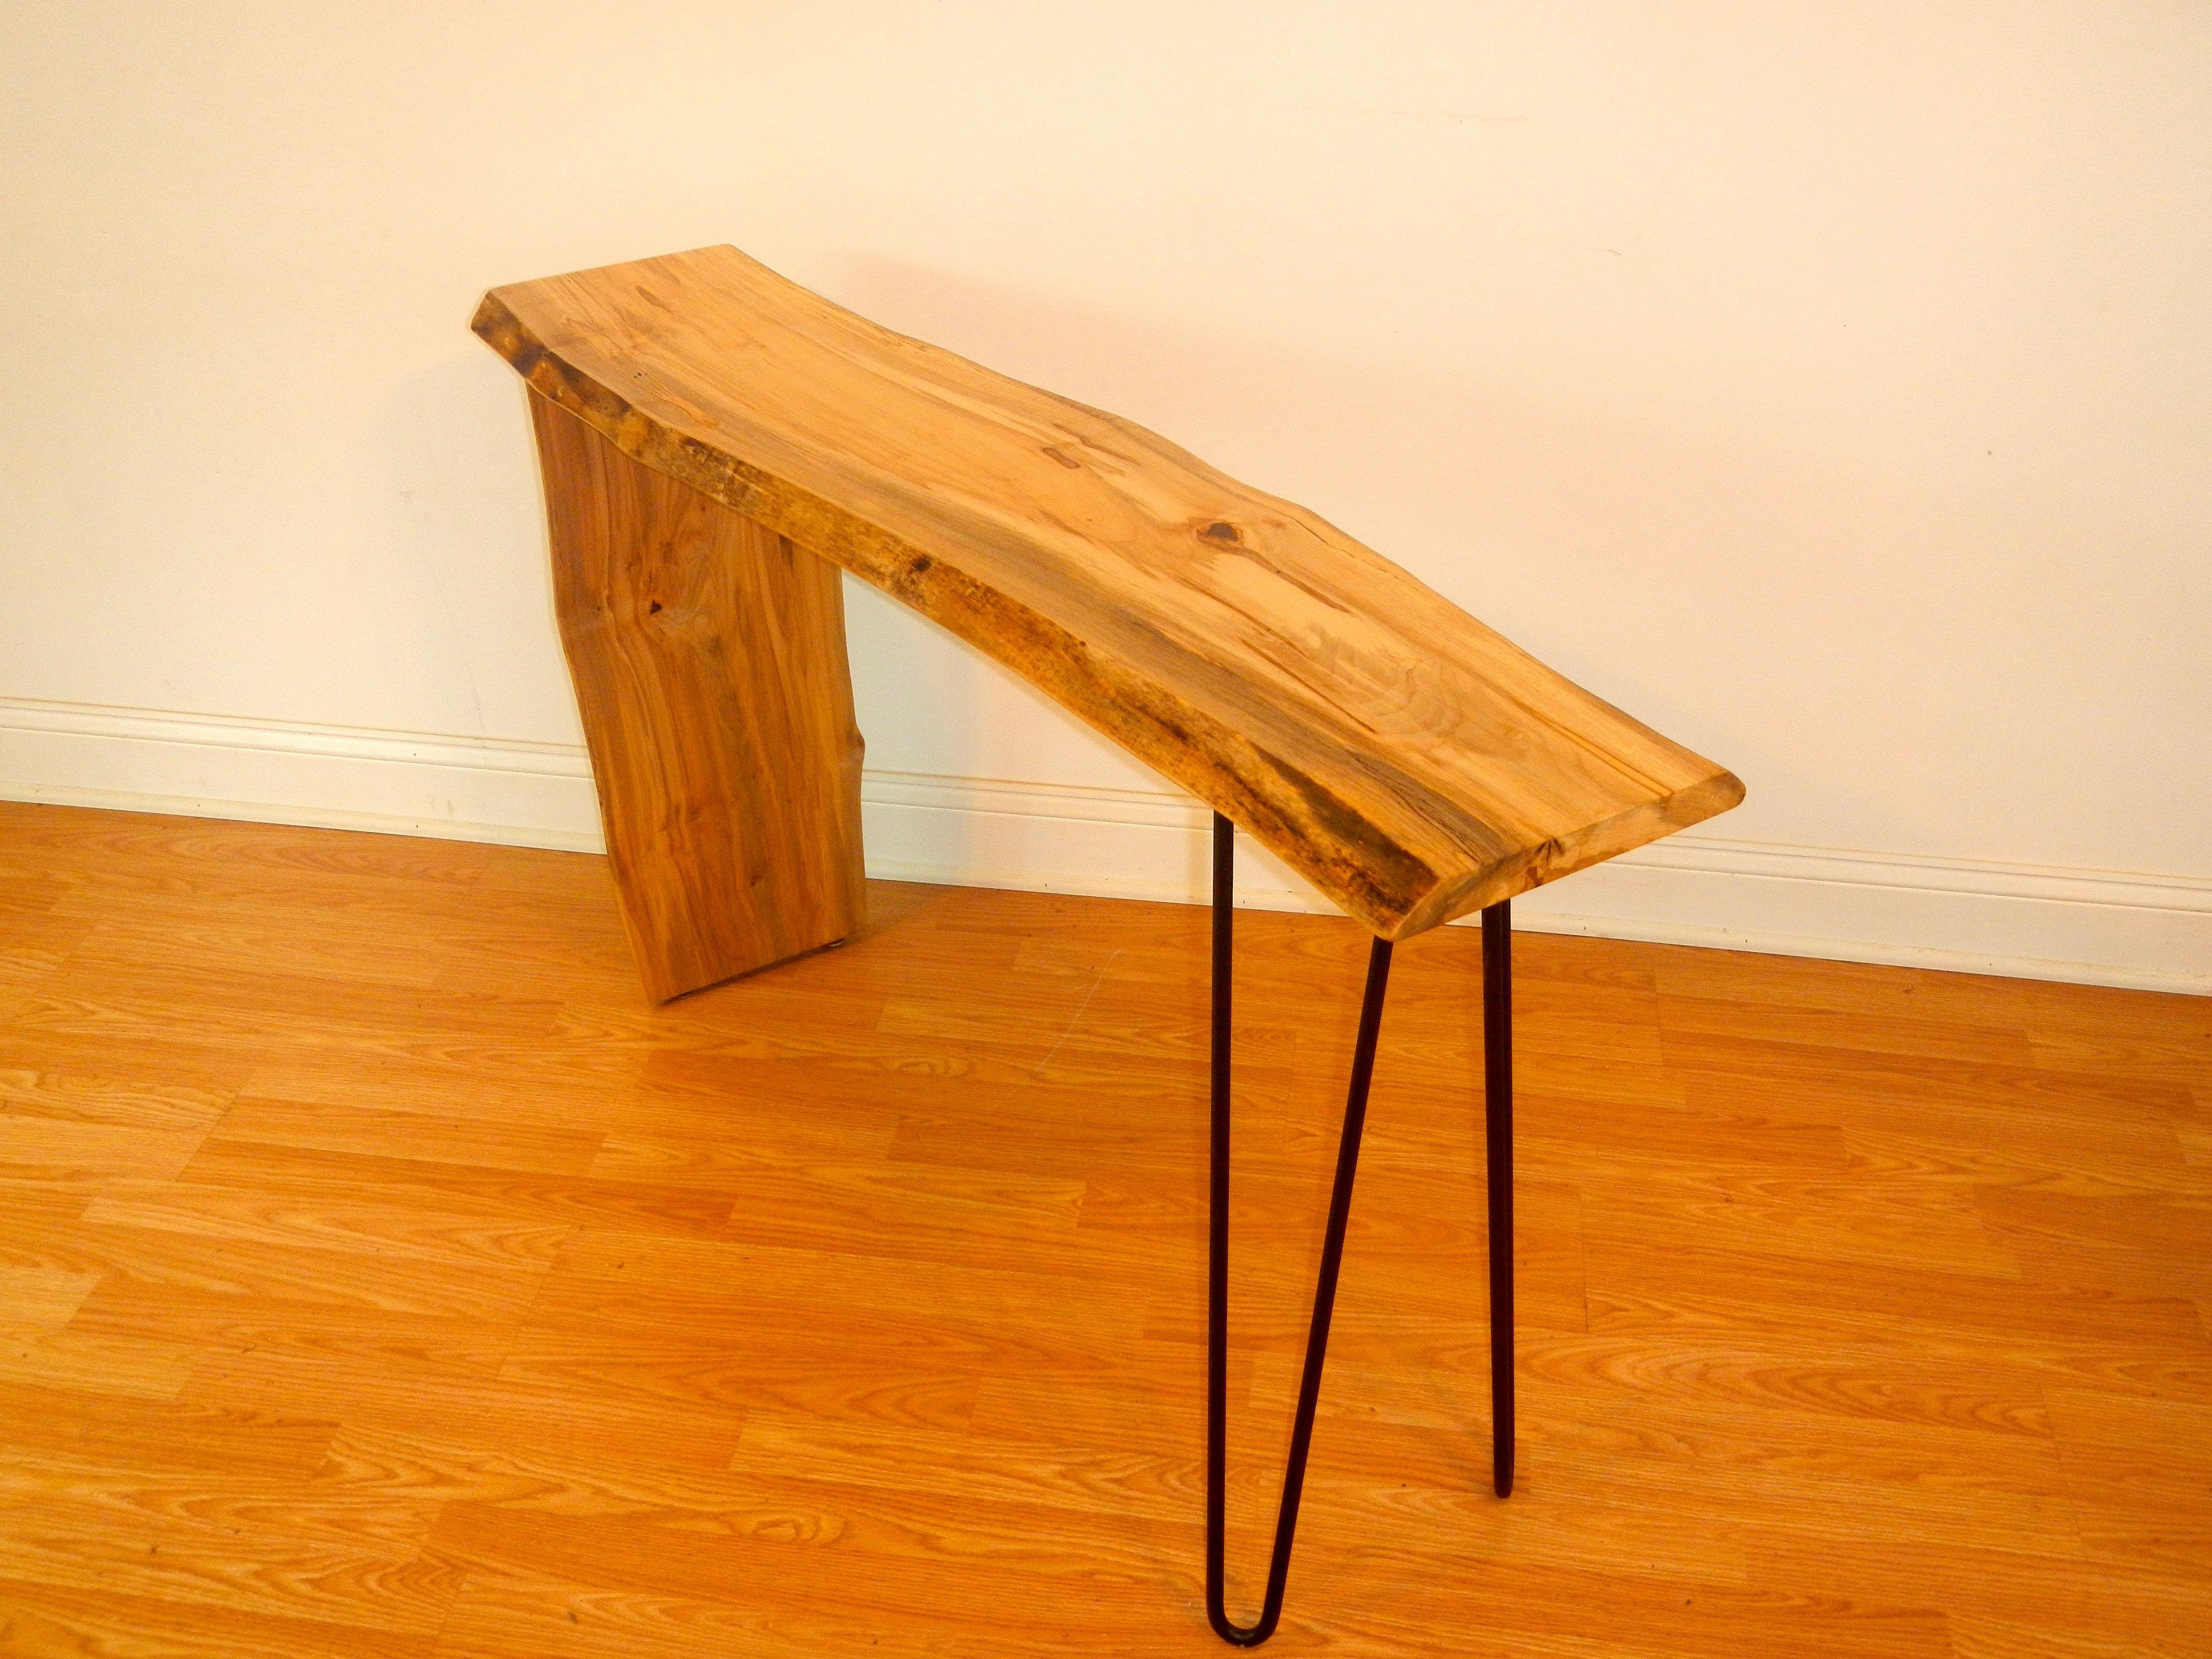 Swell Hand Made Free Form Edge Console Sofa Table Live Edge Creativecarmelina Interior Chair Design Creativecarmelinacom